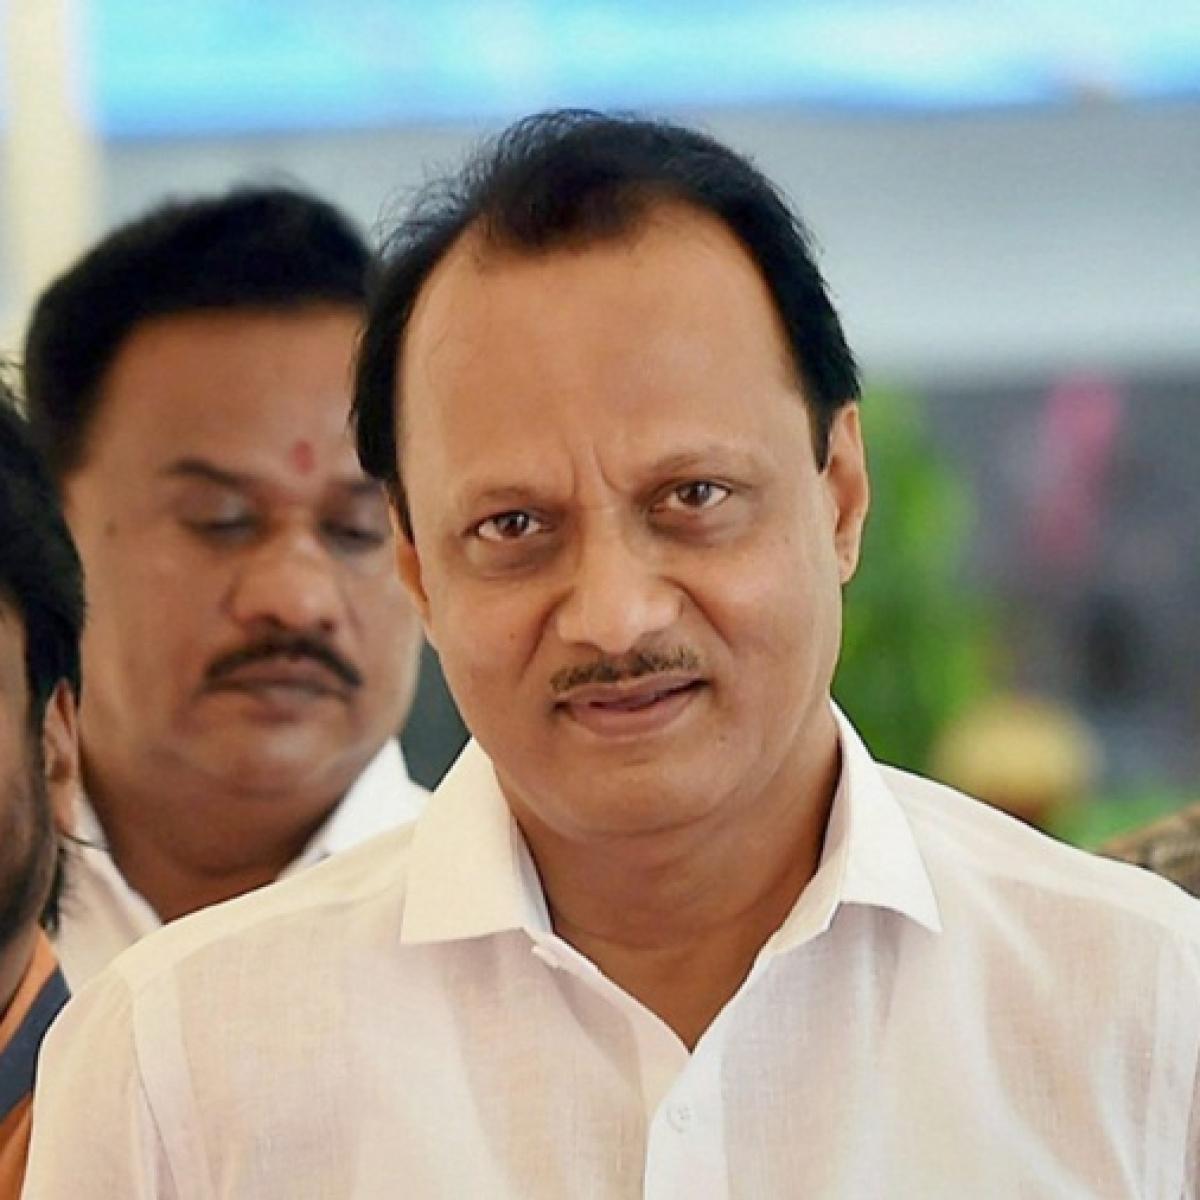 Deputy CM Ajit Pawar wants 'meritless' PIL filed against him in irrigation scam dismissed